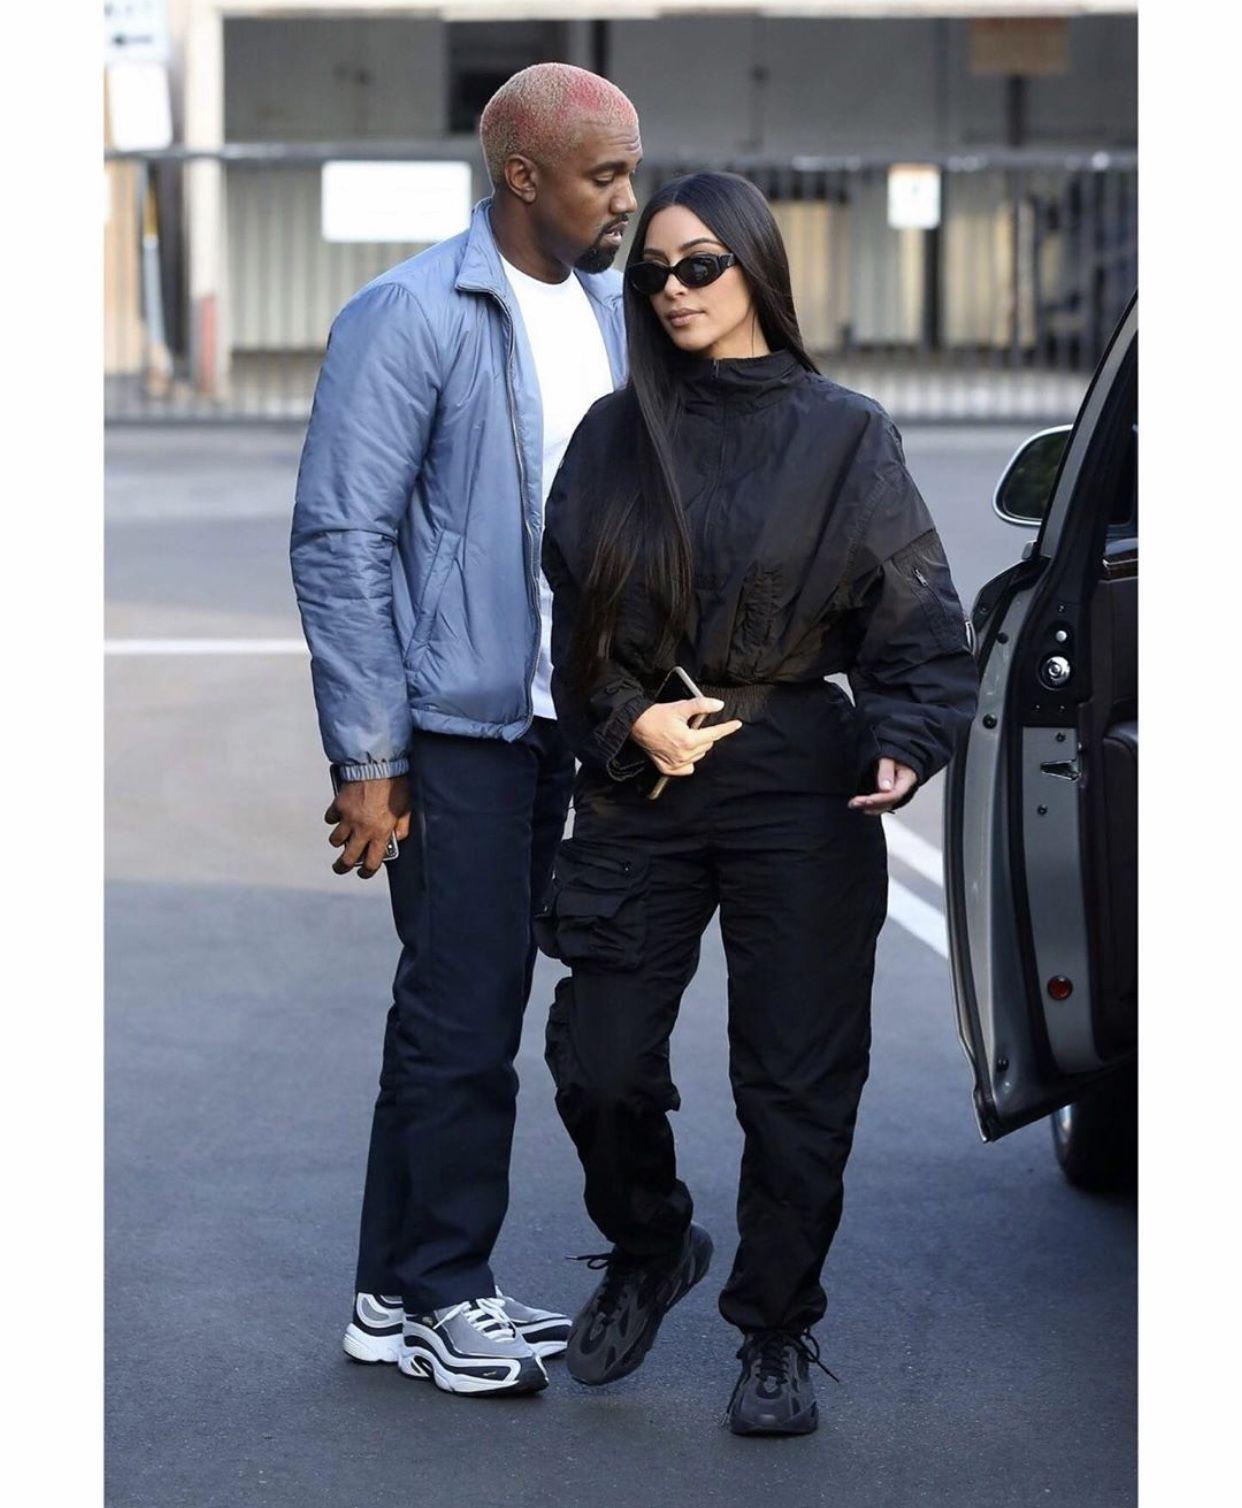 Pin By J Pvblo On Hang Kim Kardashian Outfits Kim Kardashian Style Kim Kardashian And Kanye